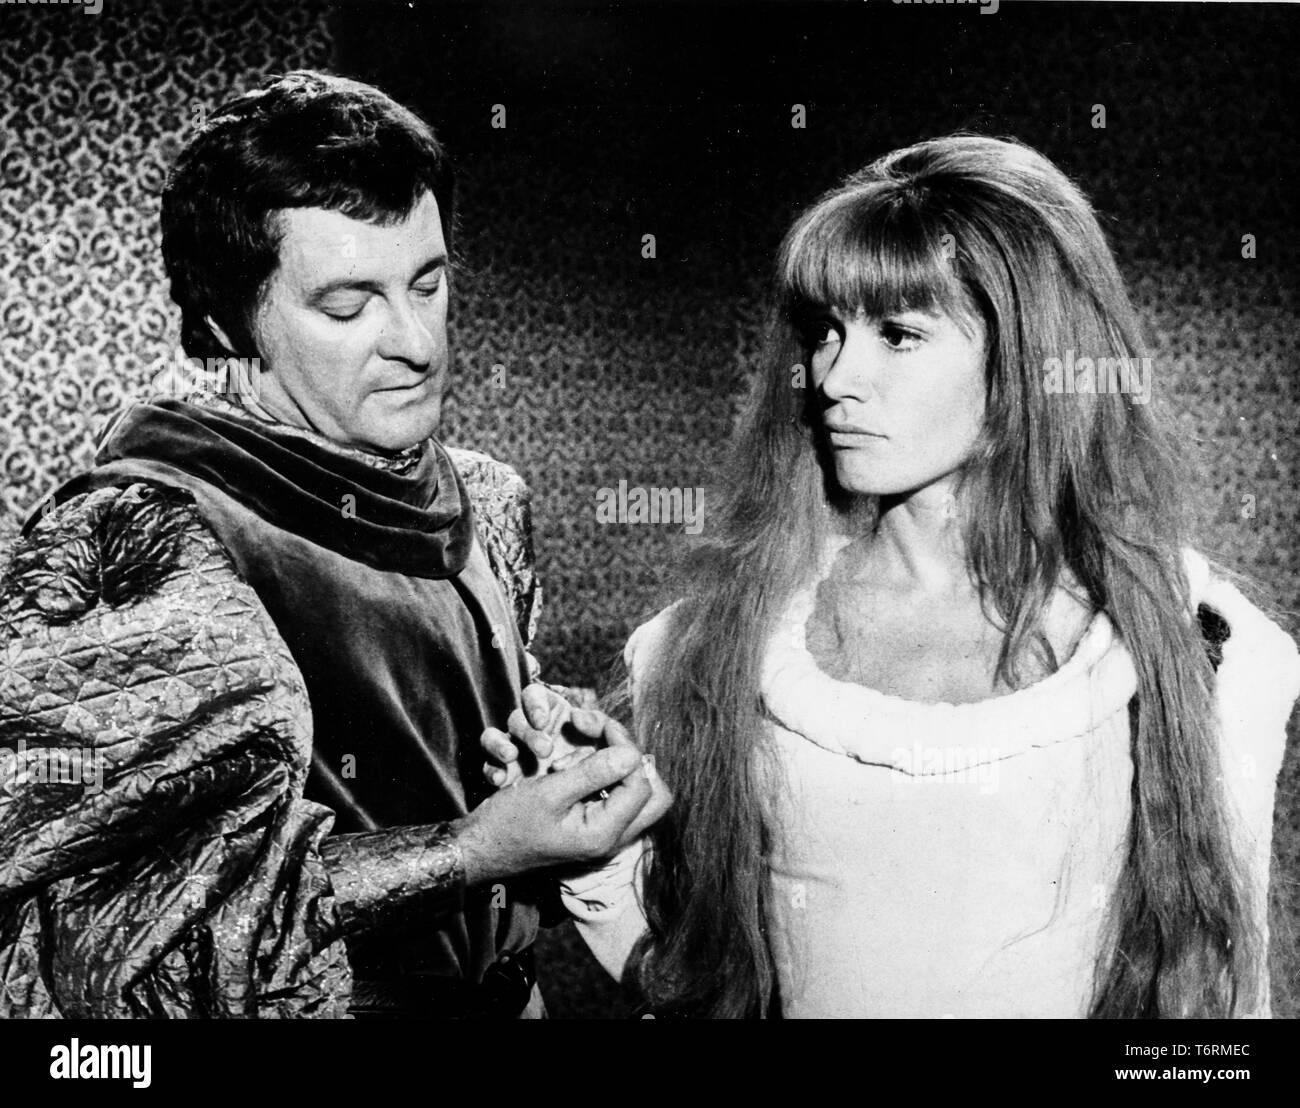 olga georges picot, roger pigaut, il suffit d'un amour, 1962 - Stock Image